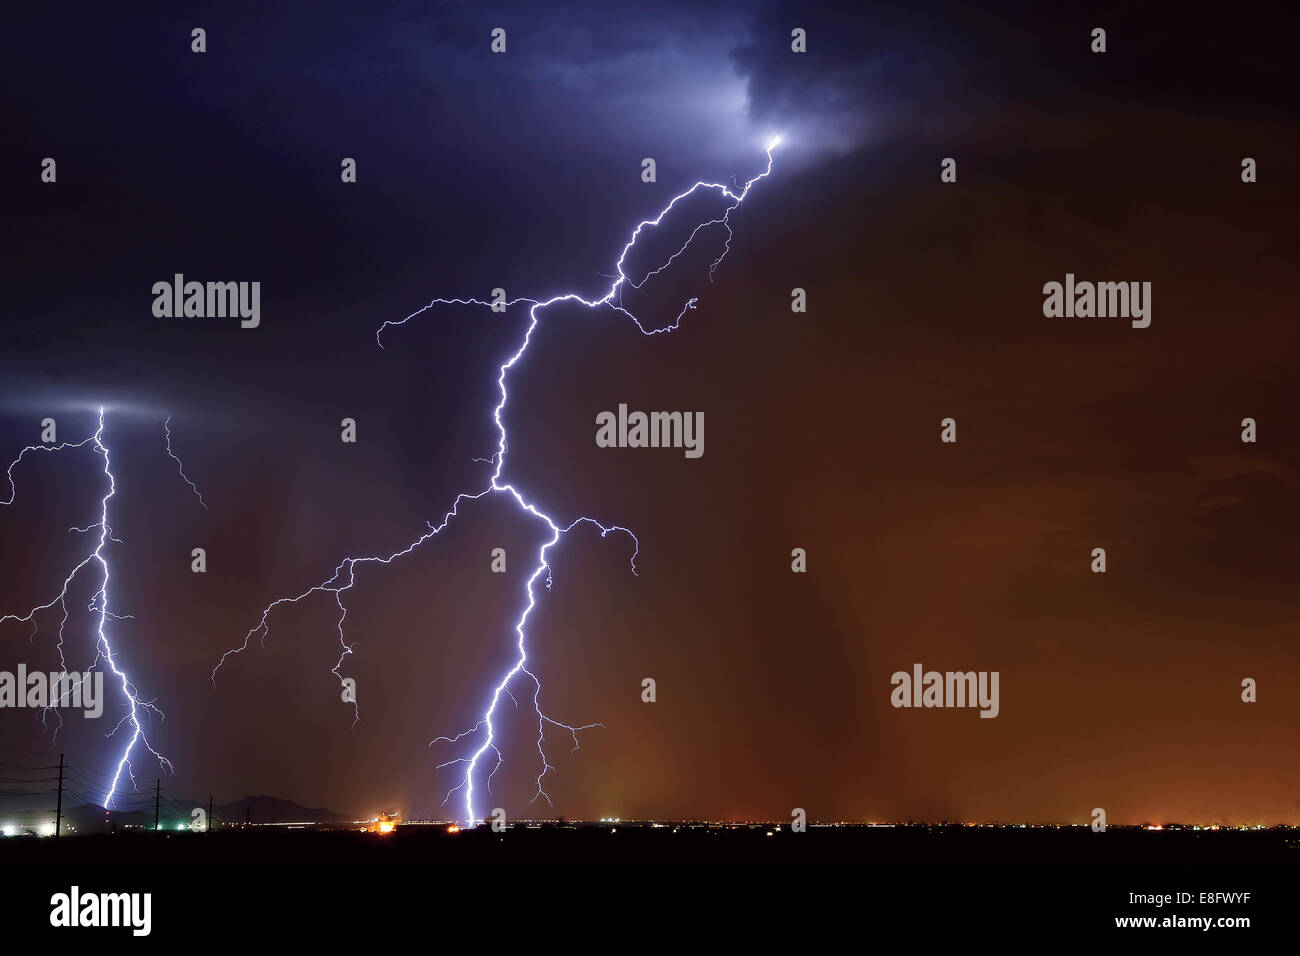 USA, Arizona, Maricopa County, Hassayampa, Lightning striking in farming area near little town - Stock Image